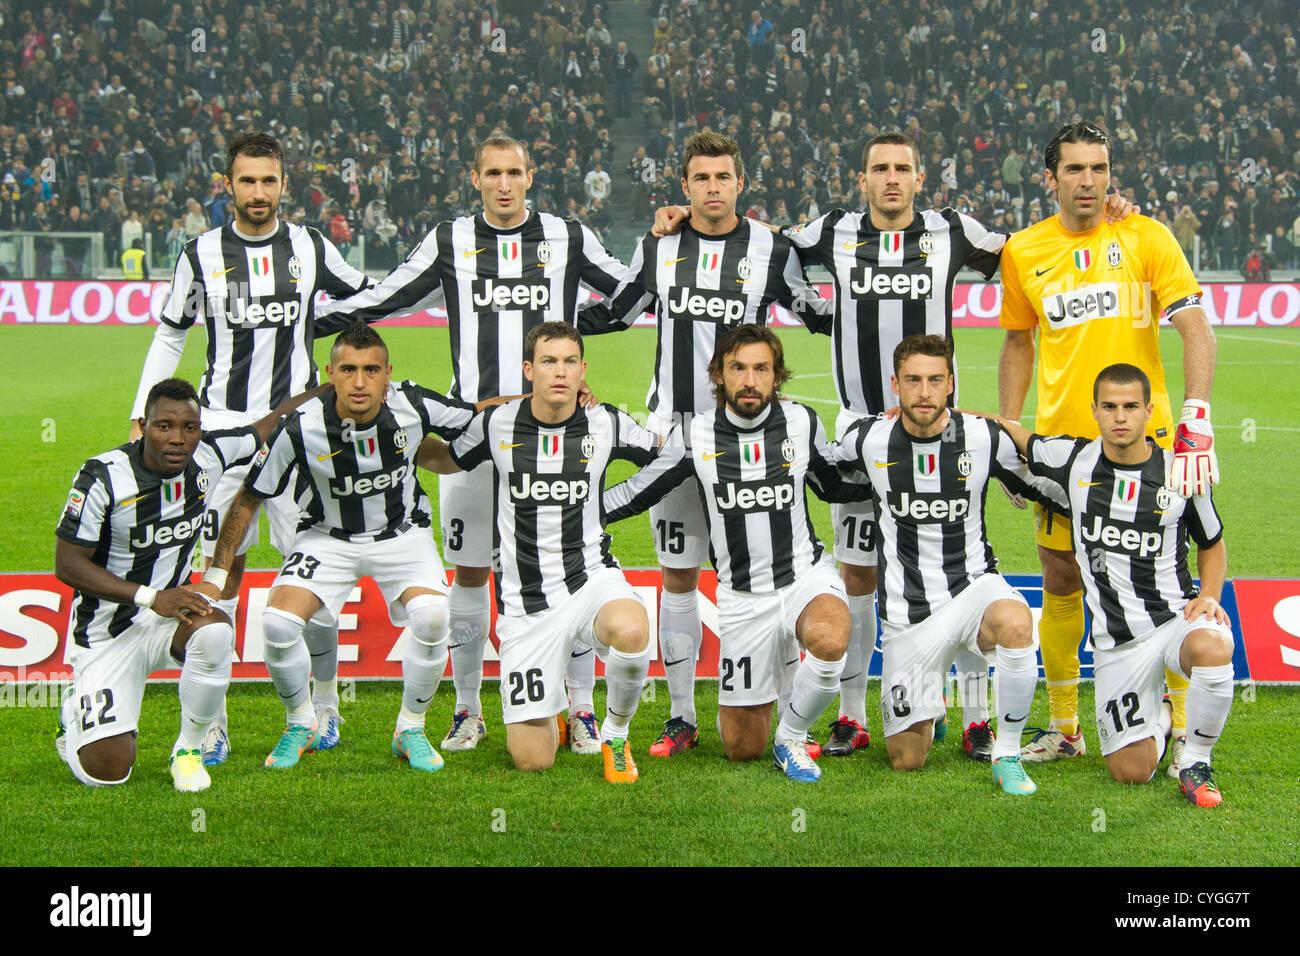 Juventus team group line-up, NOVEMBER 3, 2012